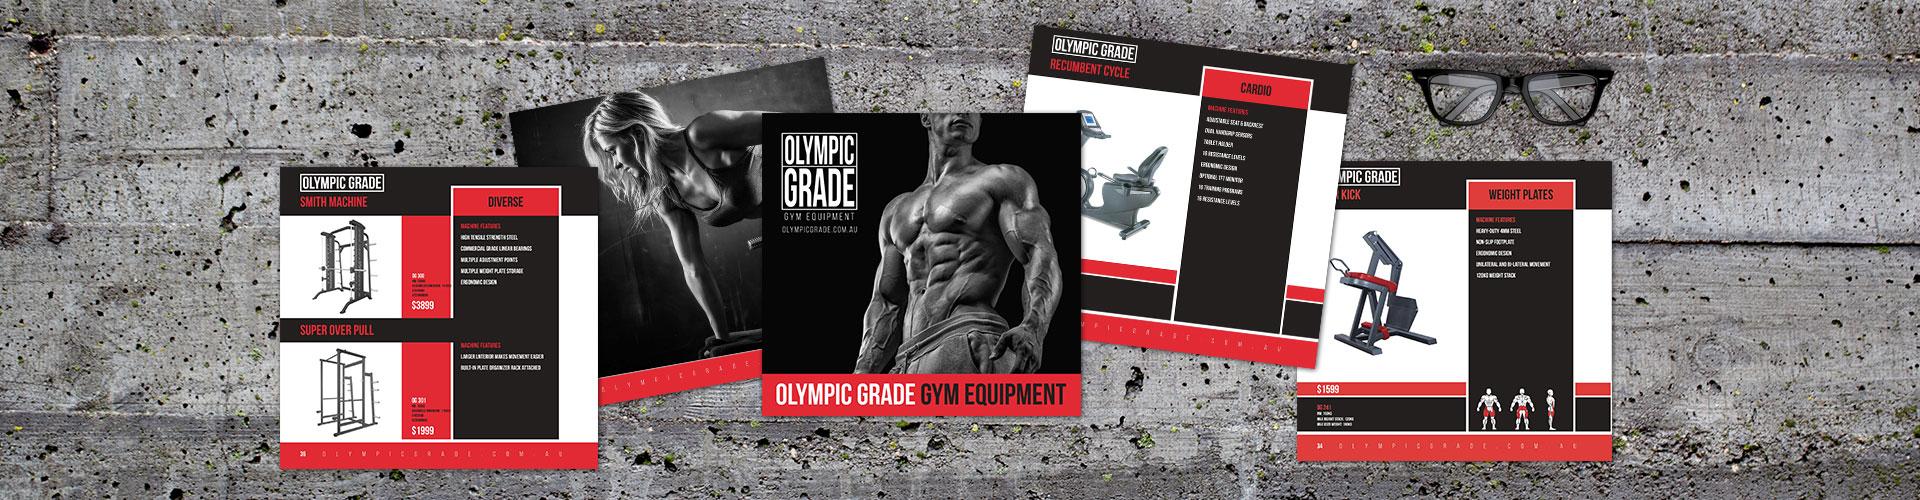 olympic-grade-banner-img